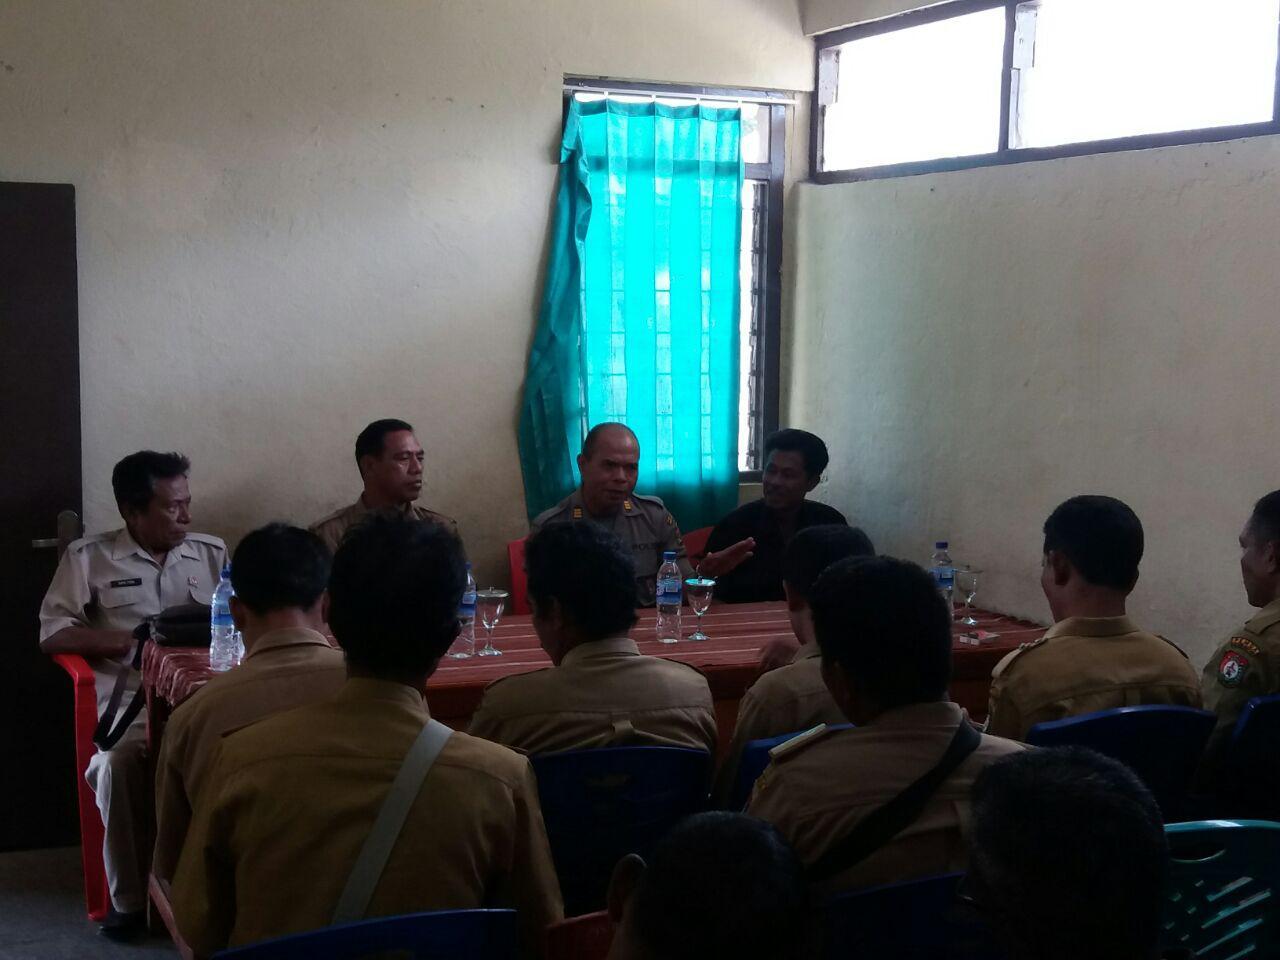 Polsek Wewewa Timur | Koodinasi Menuju Kamtibmas Yang Kondusif